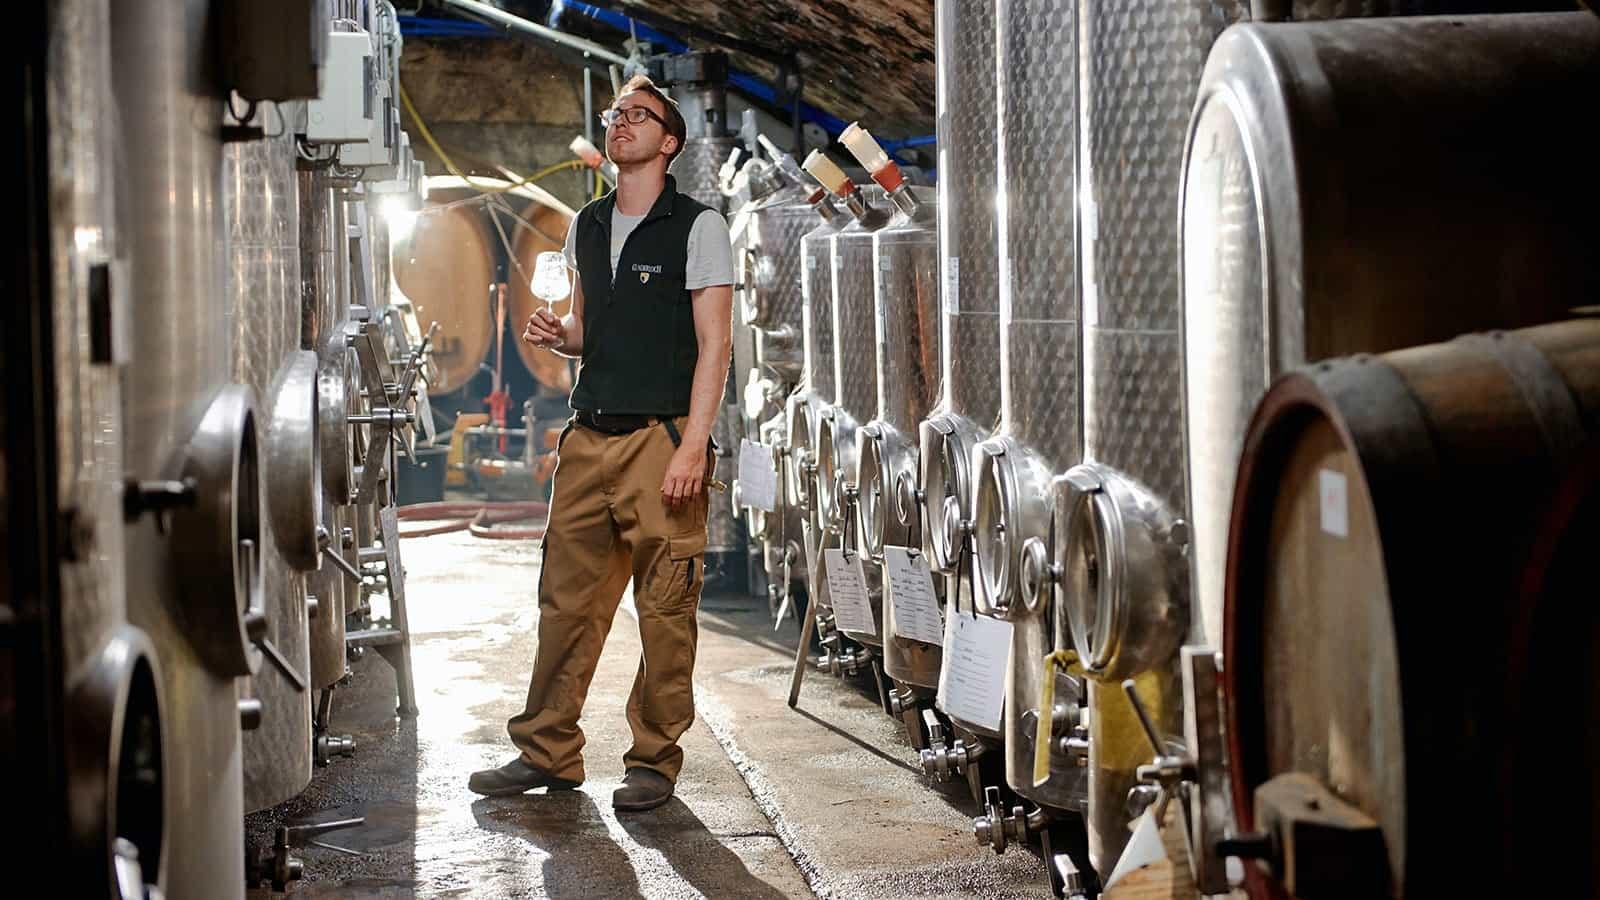 Social Distancing in the Cellar: German and Austrian Vintners Grapple with Coronavirus Shutdown